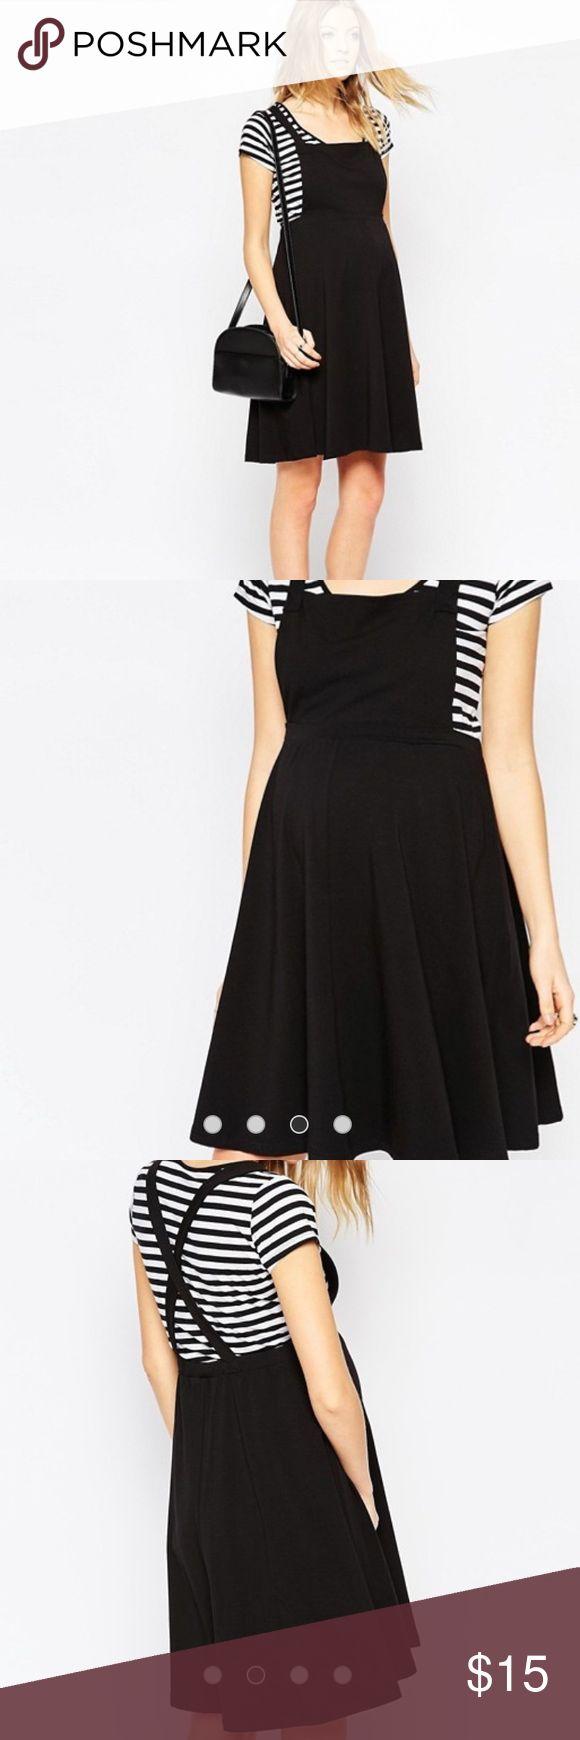 ASOS Maternity black dress Never worn dress from ASOS Maternity ASOS Maternity Dresses